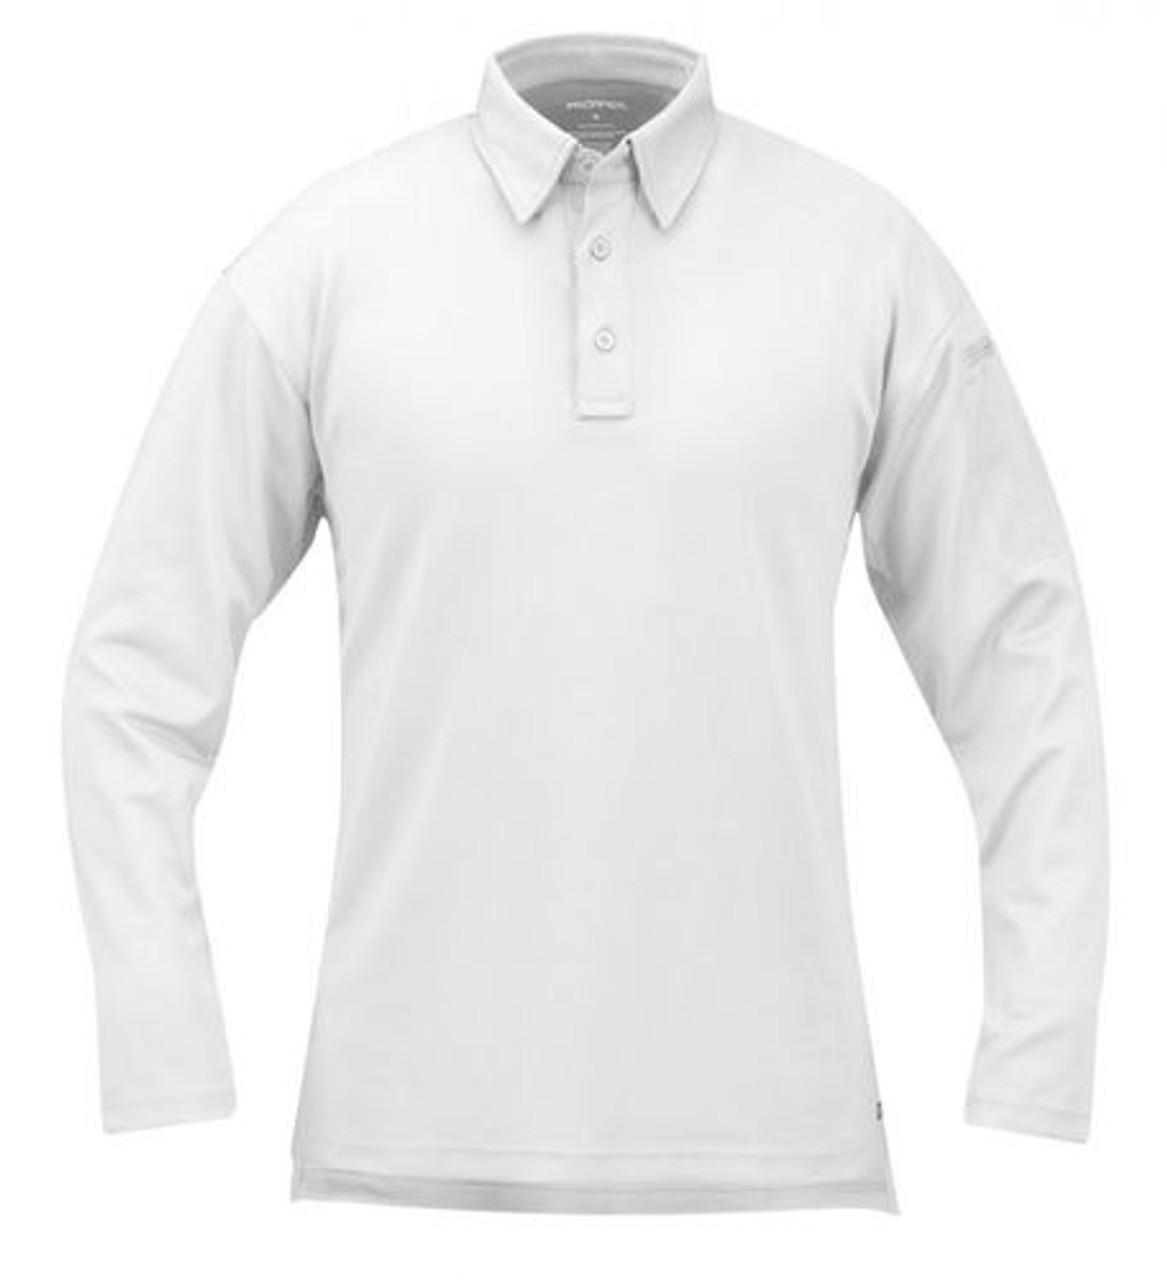 Propper F5315-72 Men's I.C.E.® Tactical Polo, Long Sleeve, Casual/Uniform, Polyester/Spandex, includes Shoulder Mic Loop